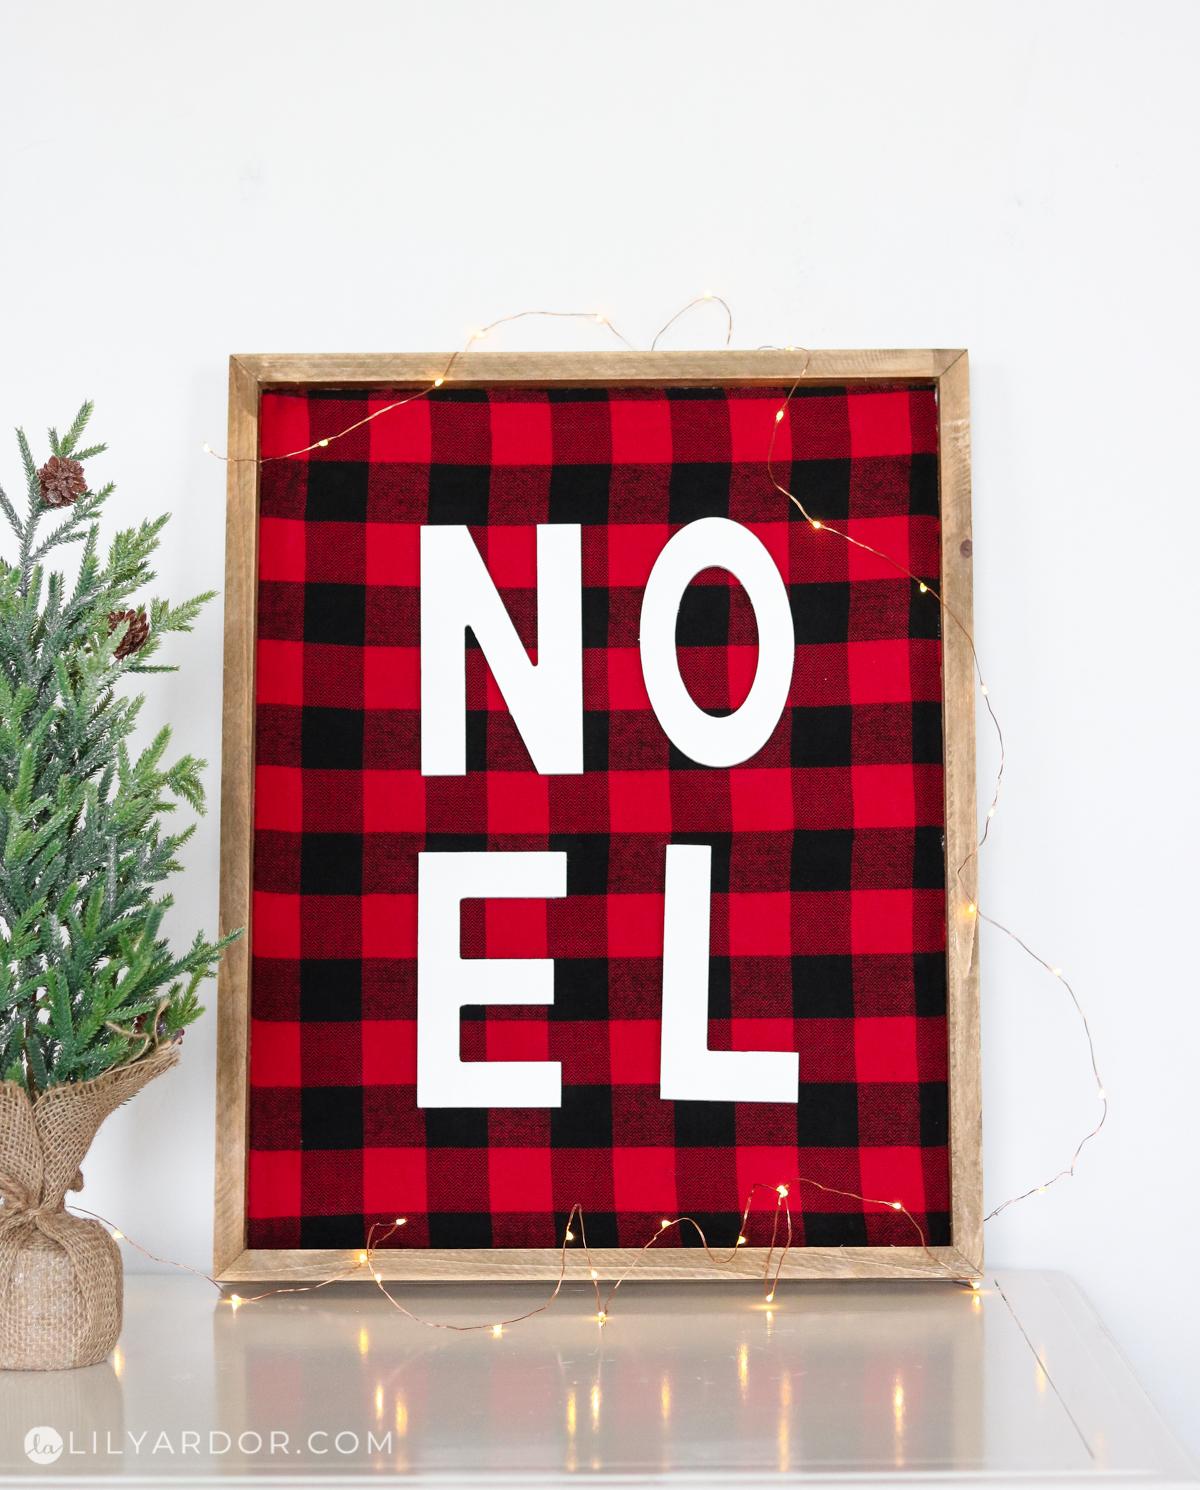 A Noel plaid sign